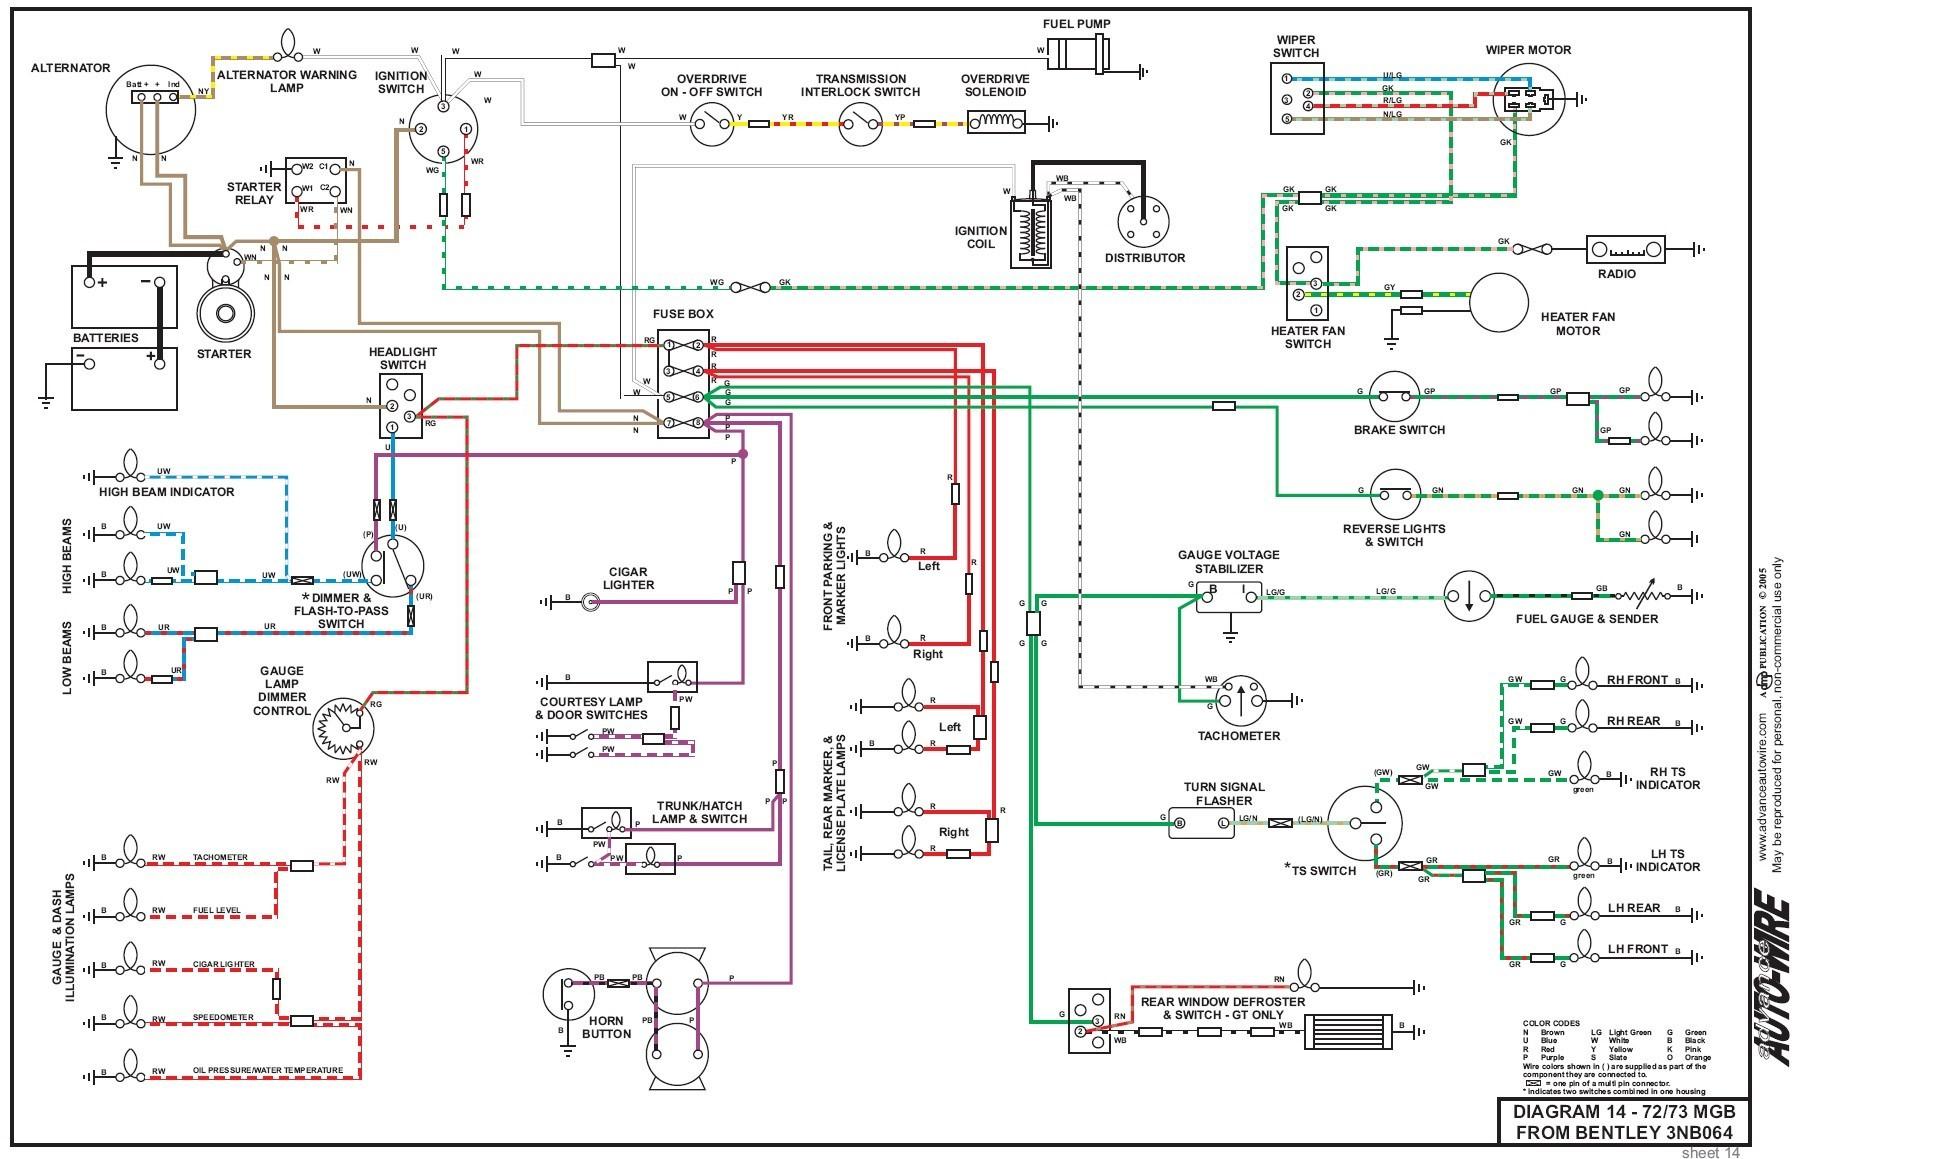 Wiring Diagram 1930 Snorkle Scissor Lift Lb 3789] Car Lifts Wiring Diagram Download Diagram Of Wiring Diagram 1930 Snorkle Scissor Lift